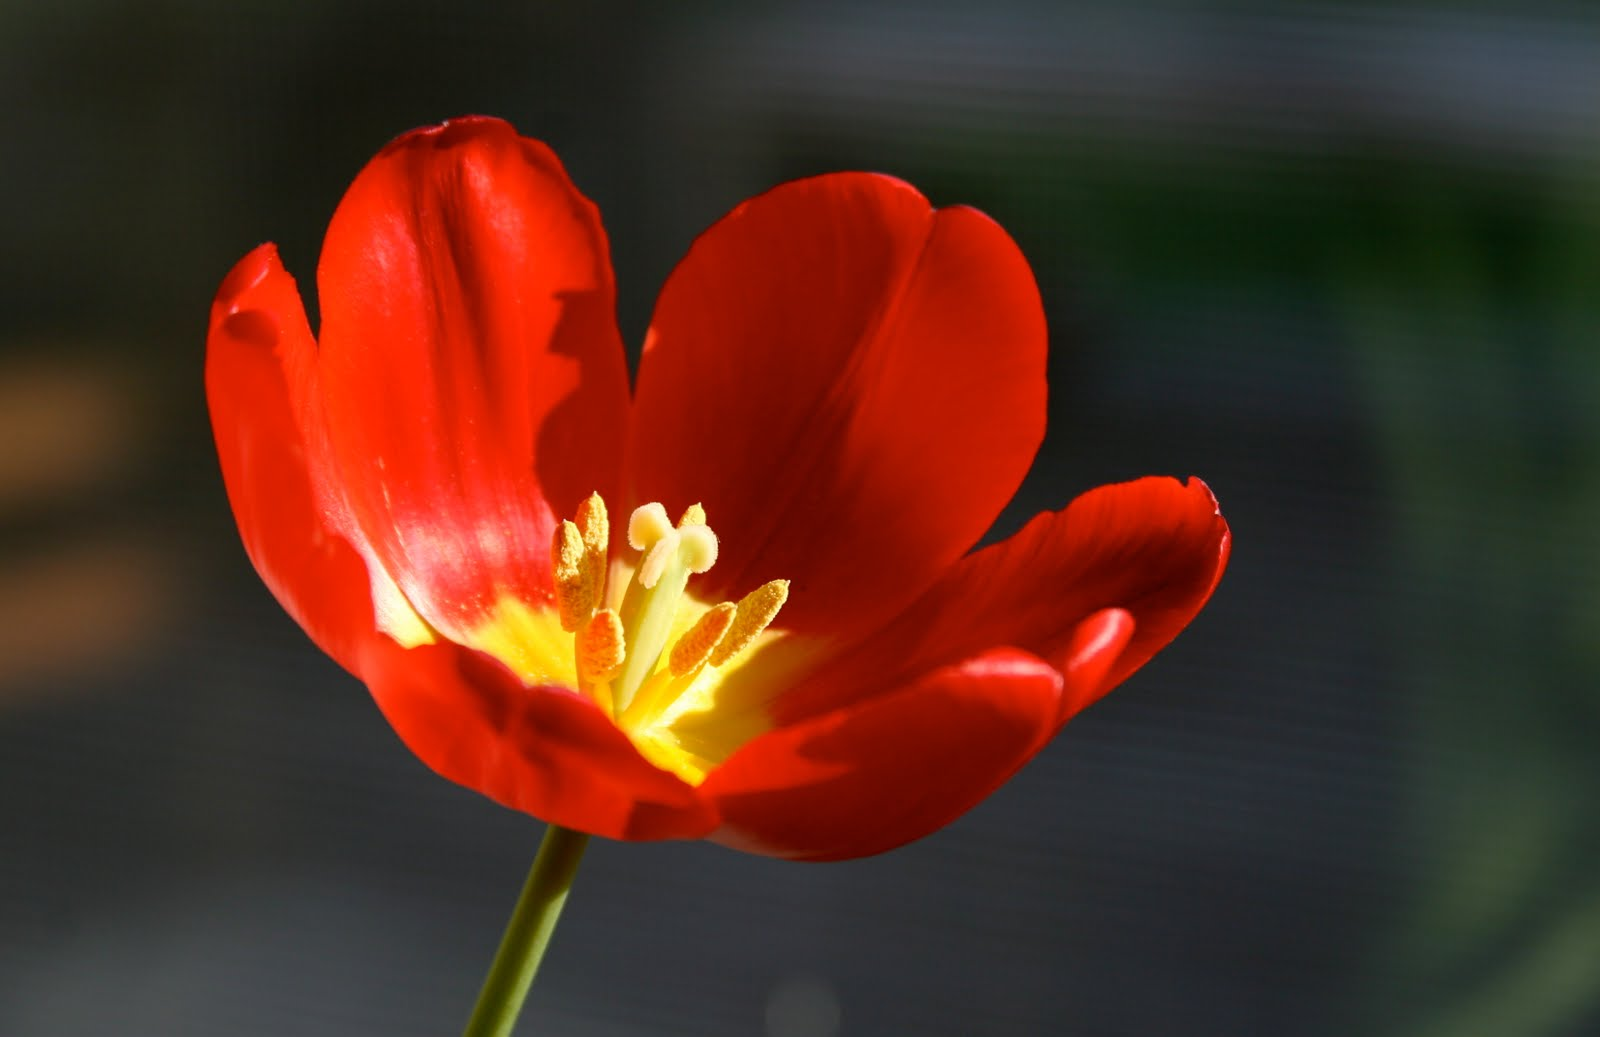 Фото одного цветка тюльпана